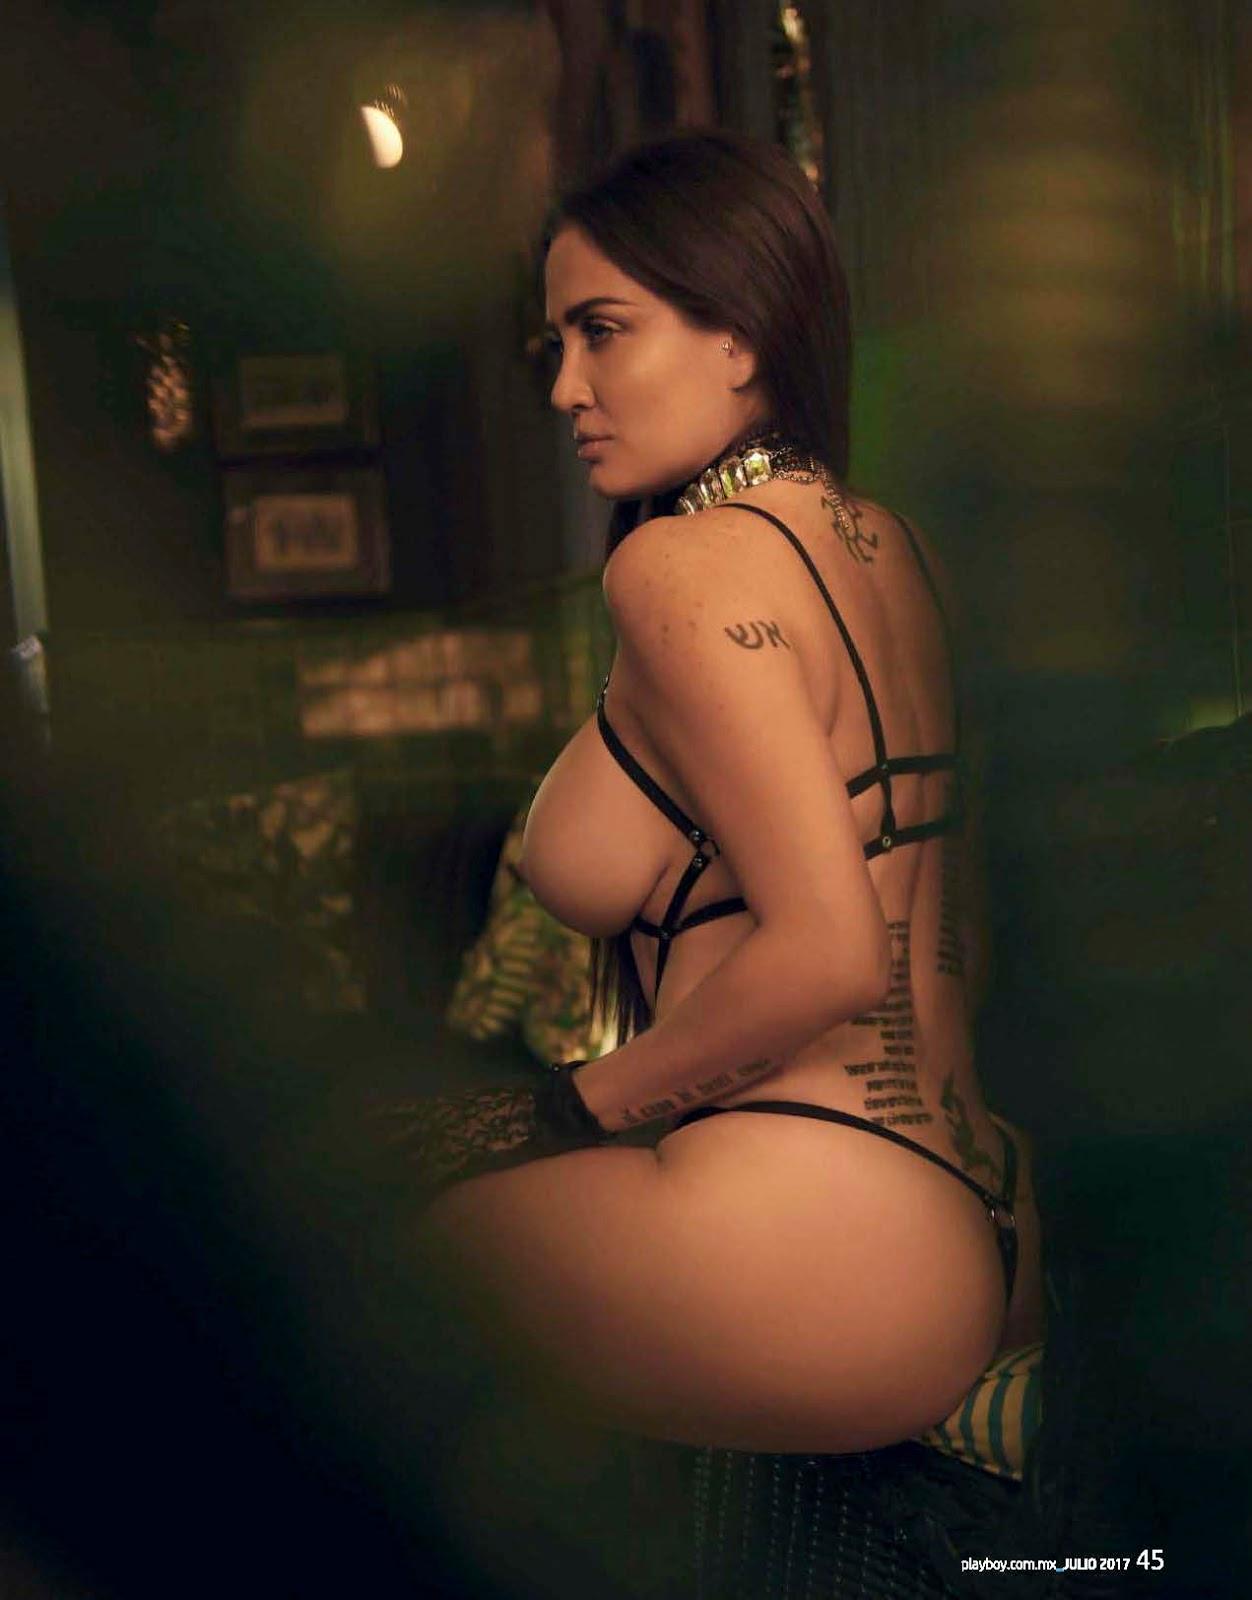 Celia Lora / Playboy